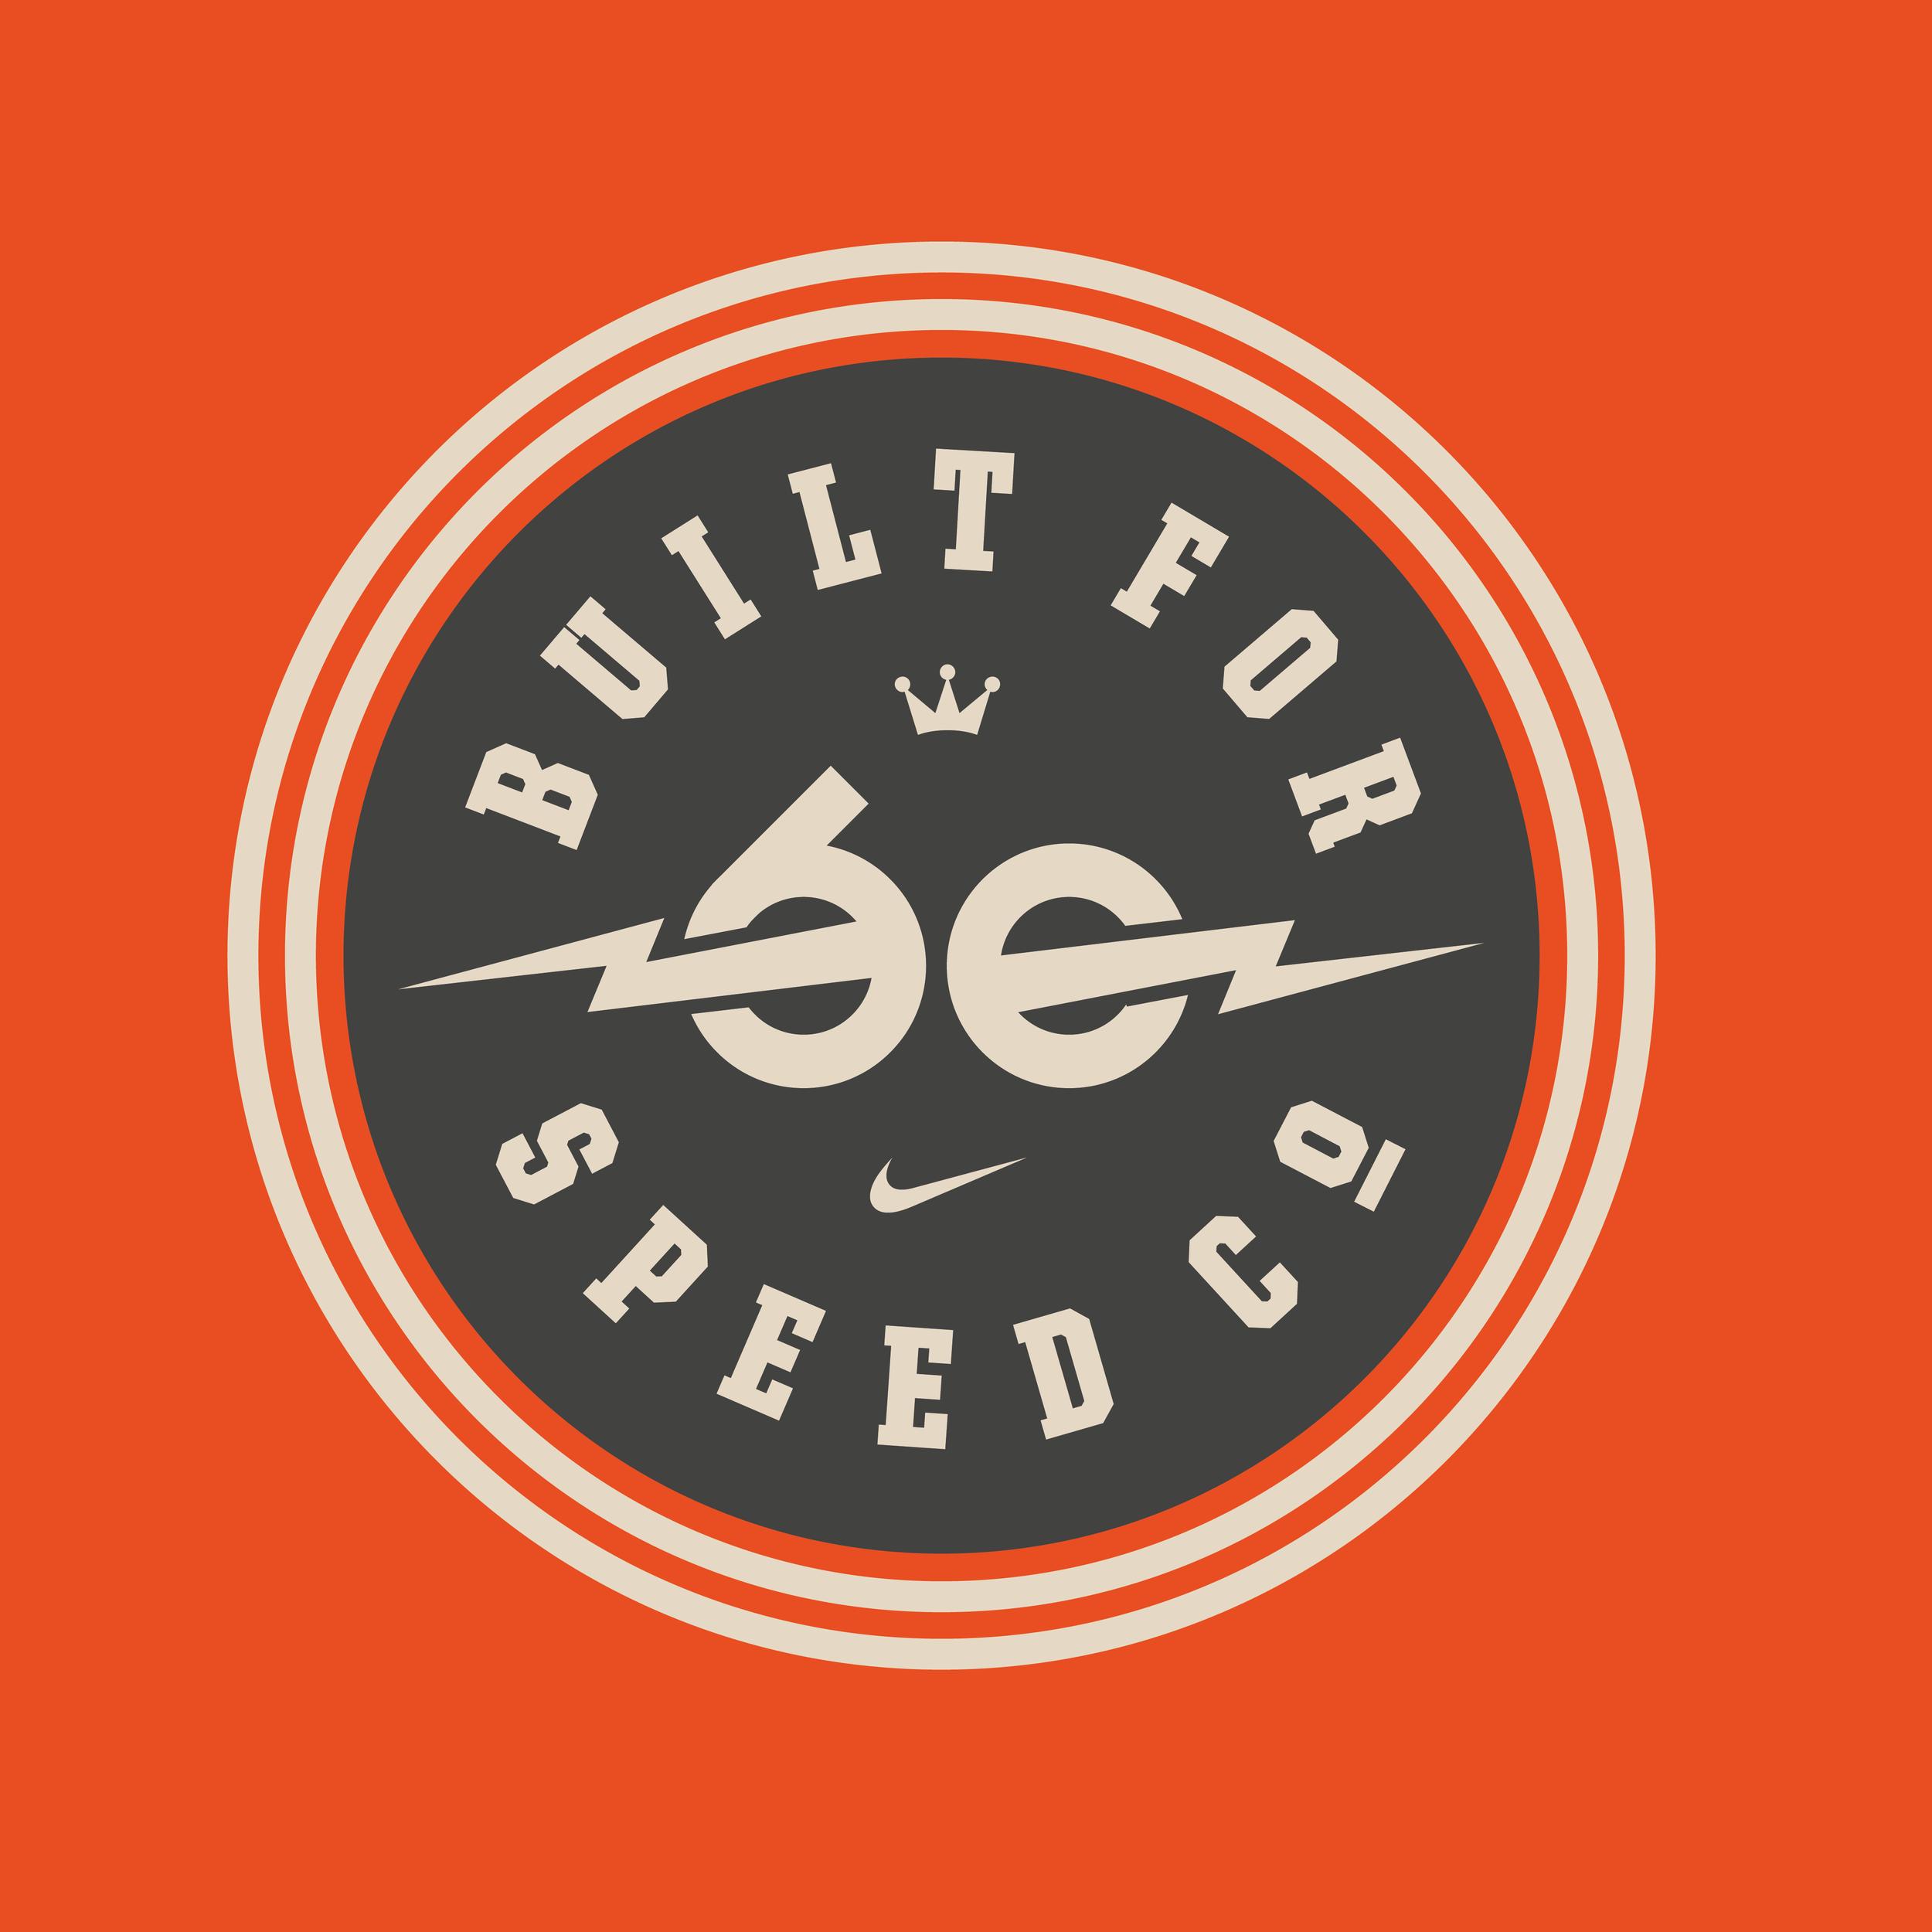 Logos_Second40-01.png